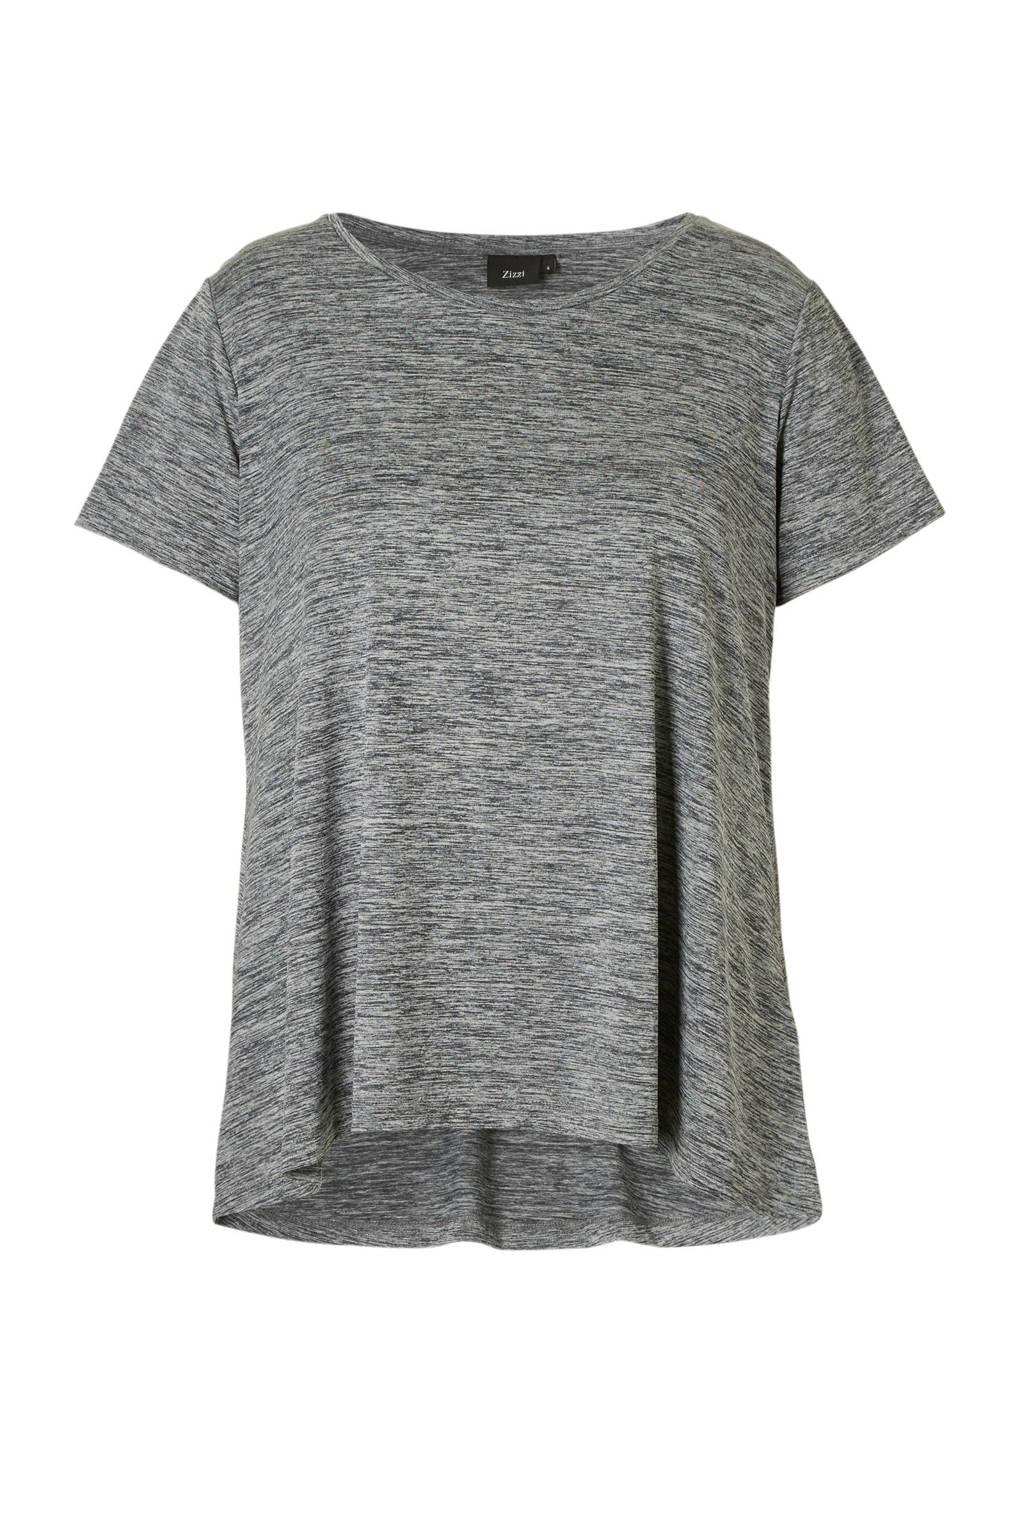 ACTIVE By Zizzi sport T-shirt grijs, Grijs